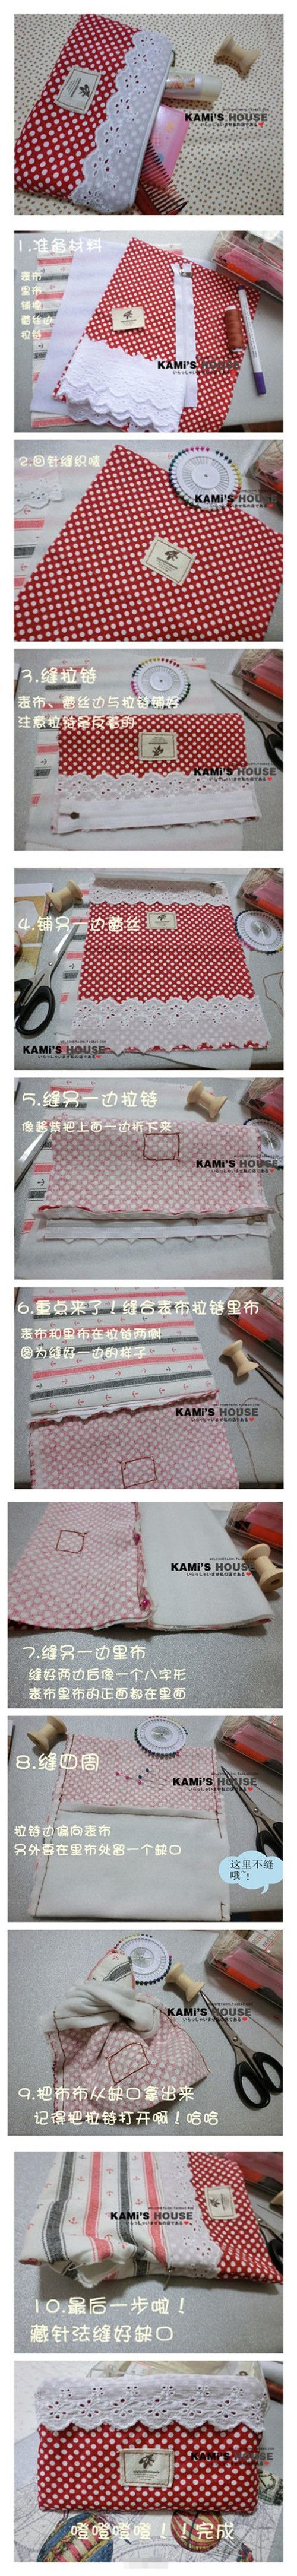 How to Make Stylish Fabric Handmade bags965